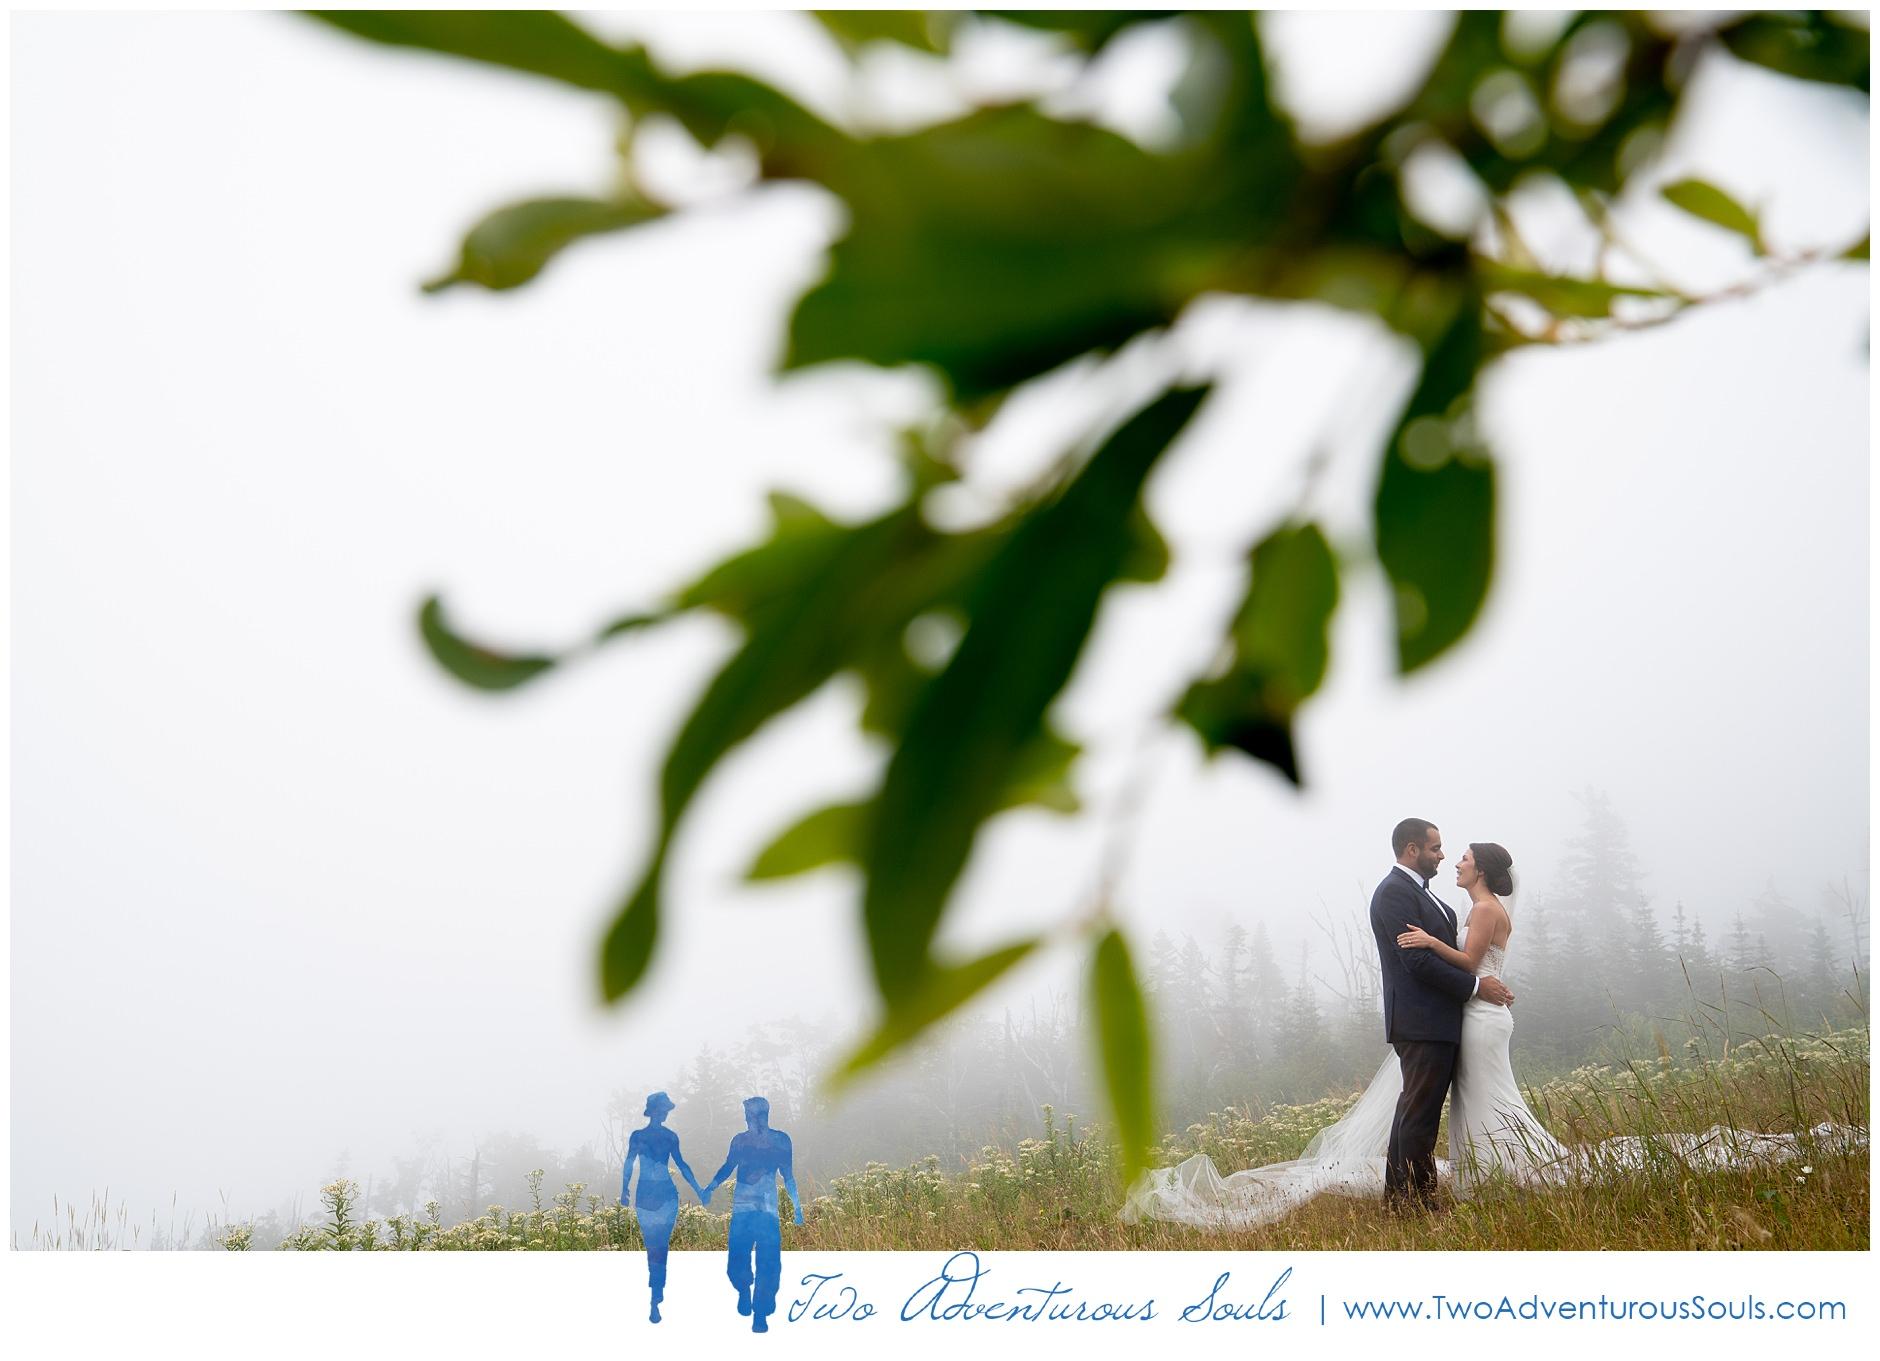 Sugarloaf Outdoor Center Wedding Photographers, Destination Wedding Photographers, Two Adventurous Souls-081719_0022.jpg